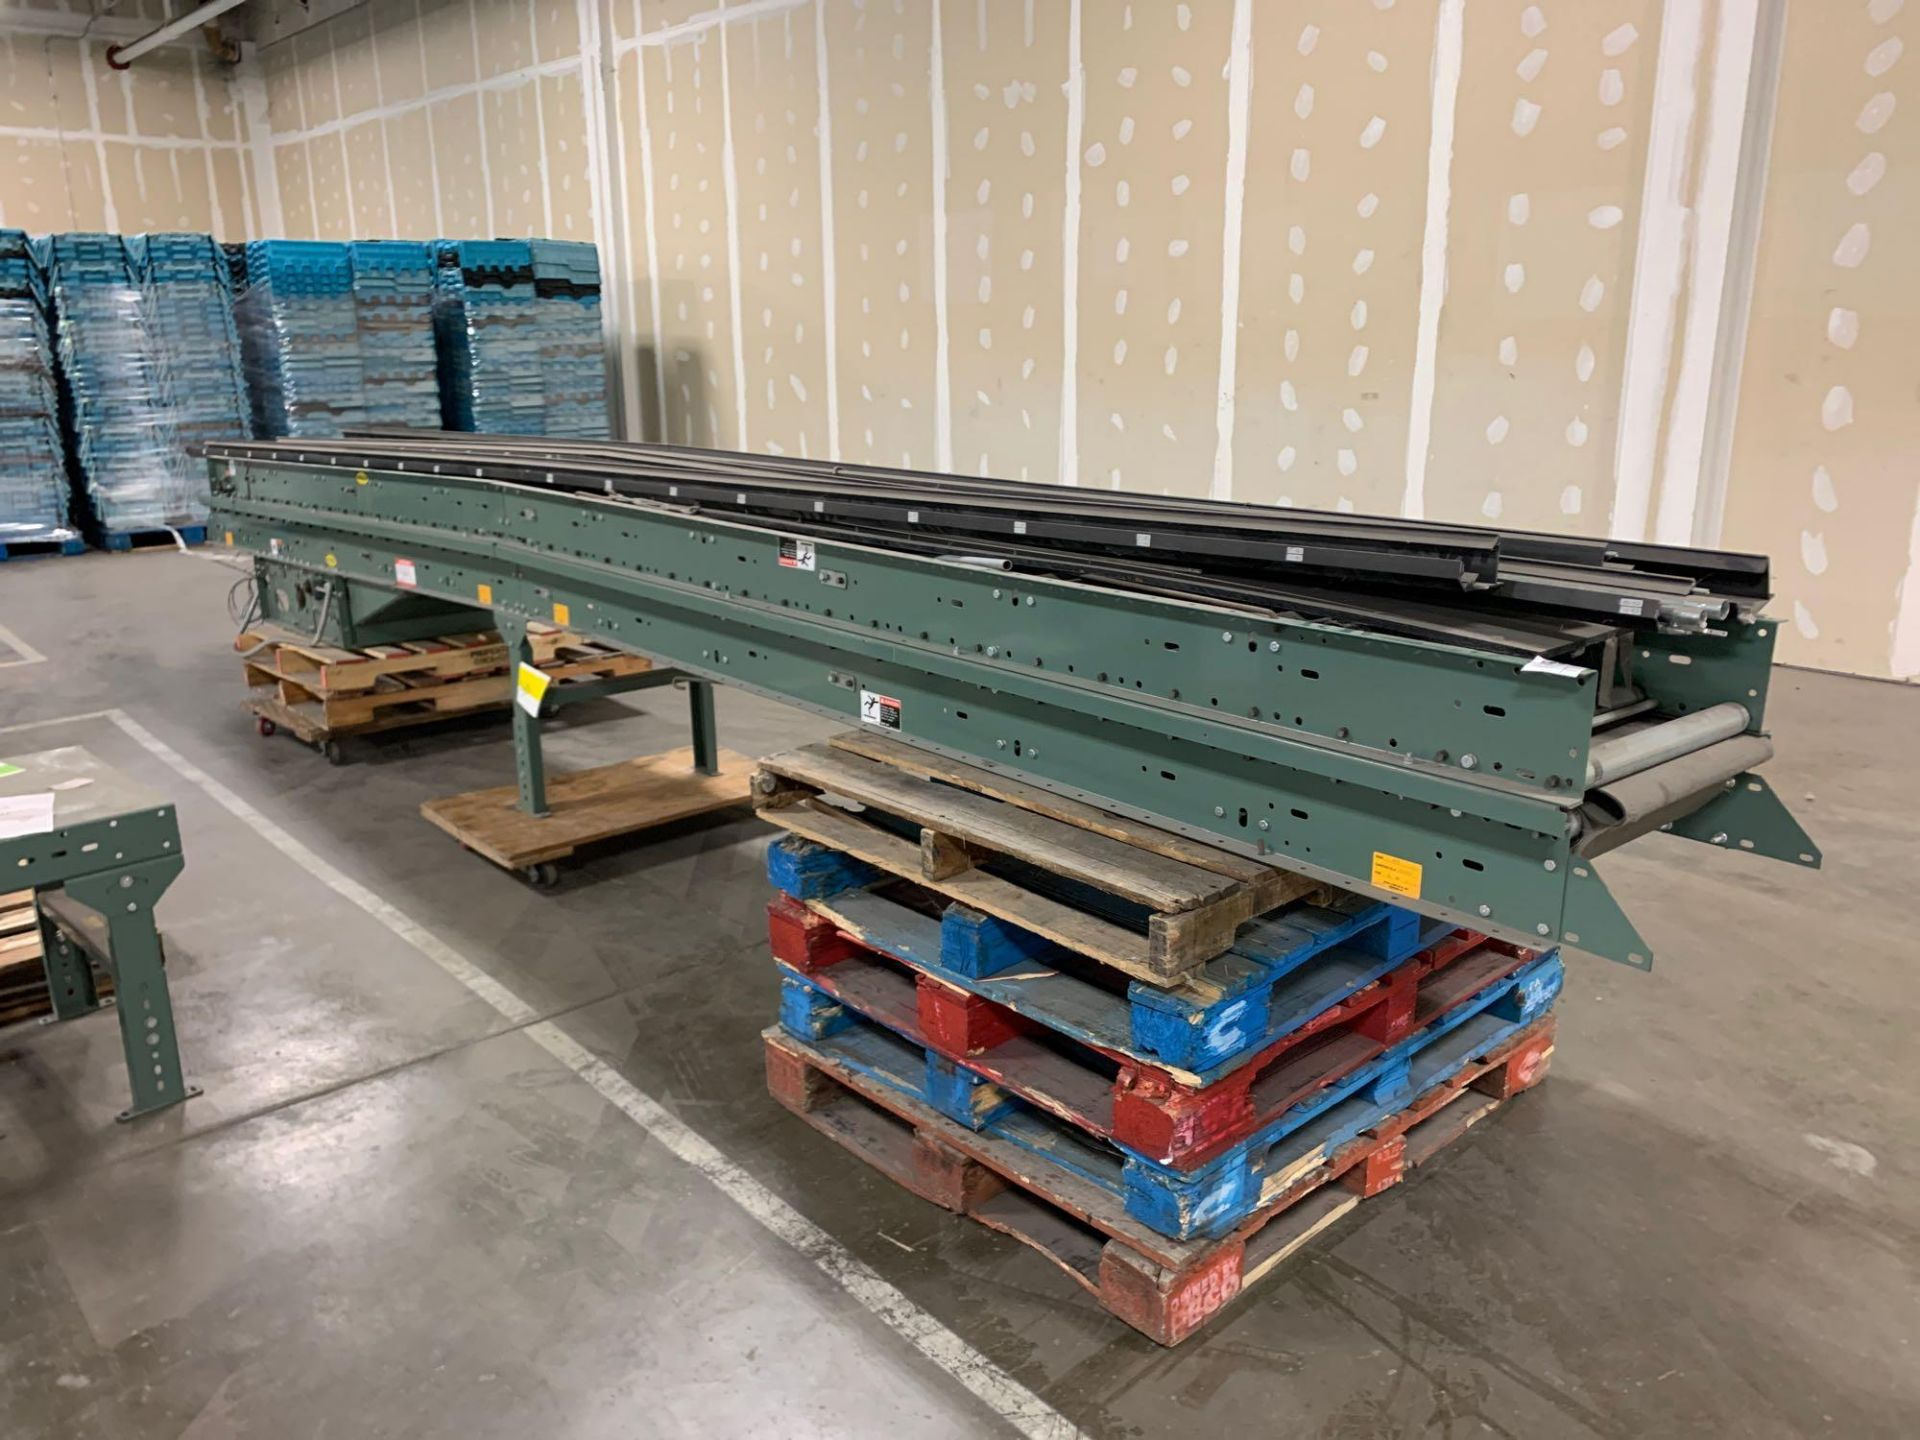 (2) Hytrol 20' Conveyor Line Section